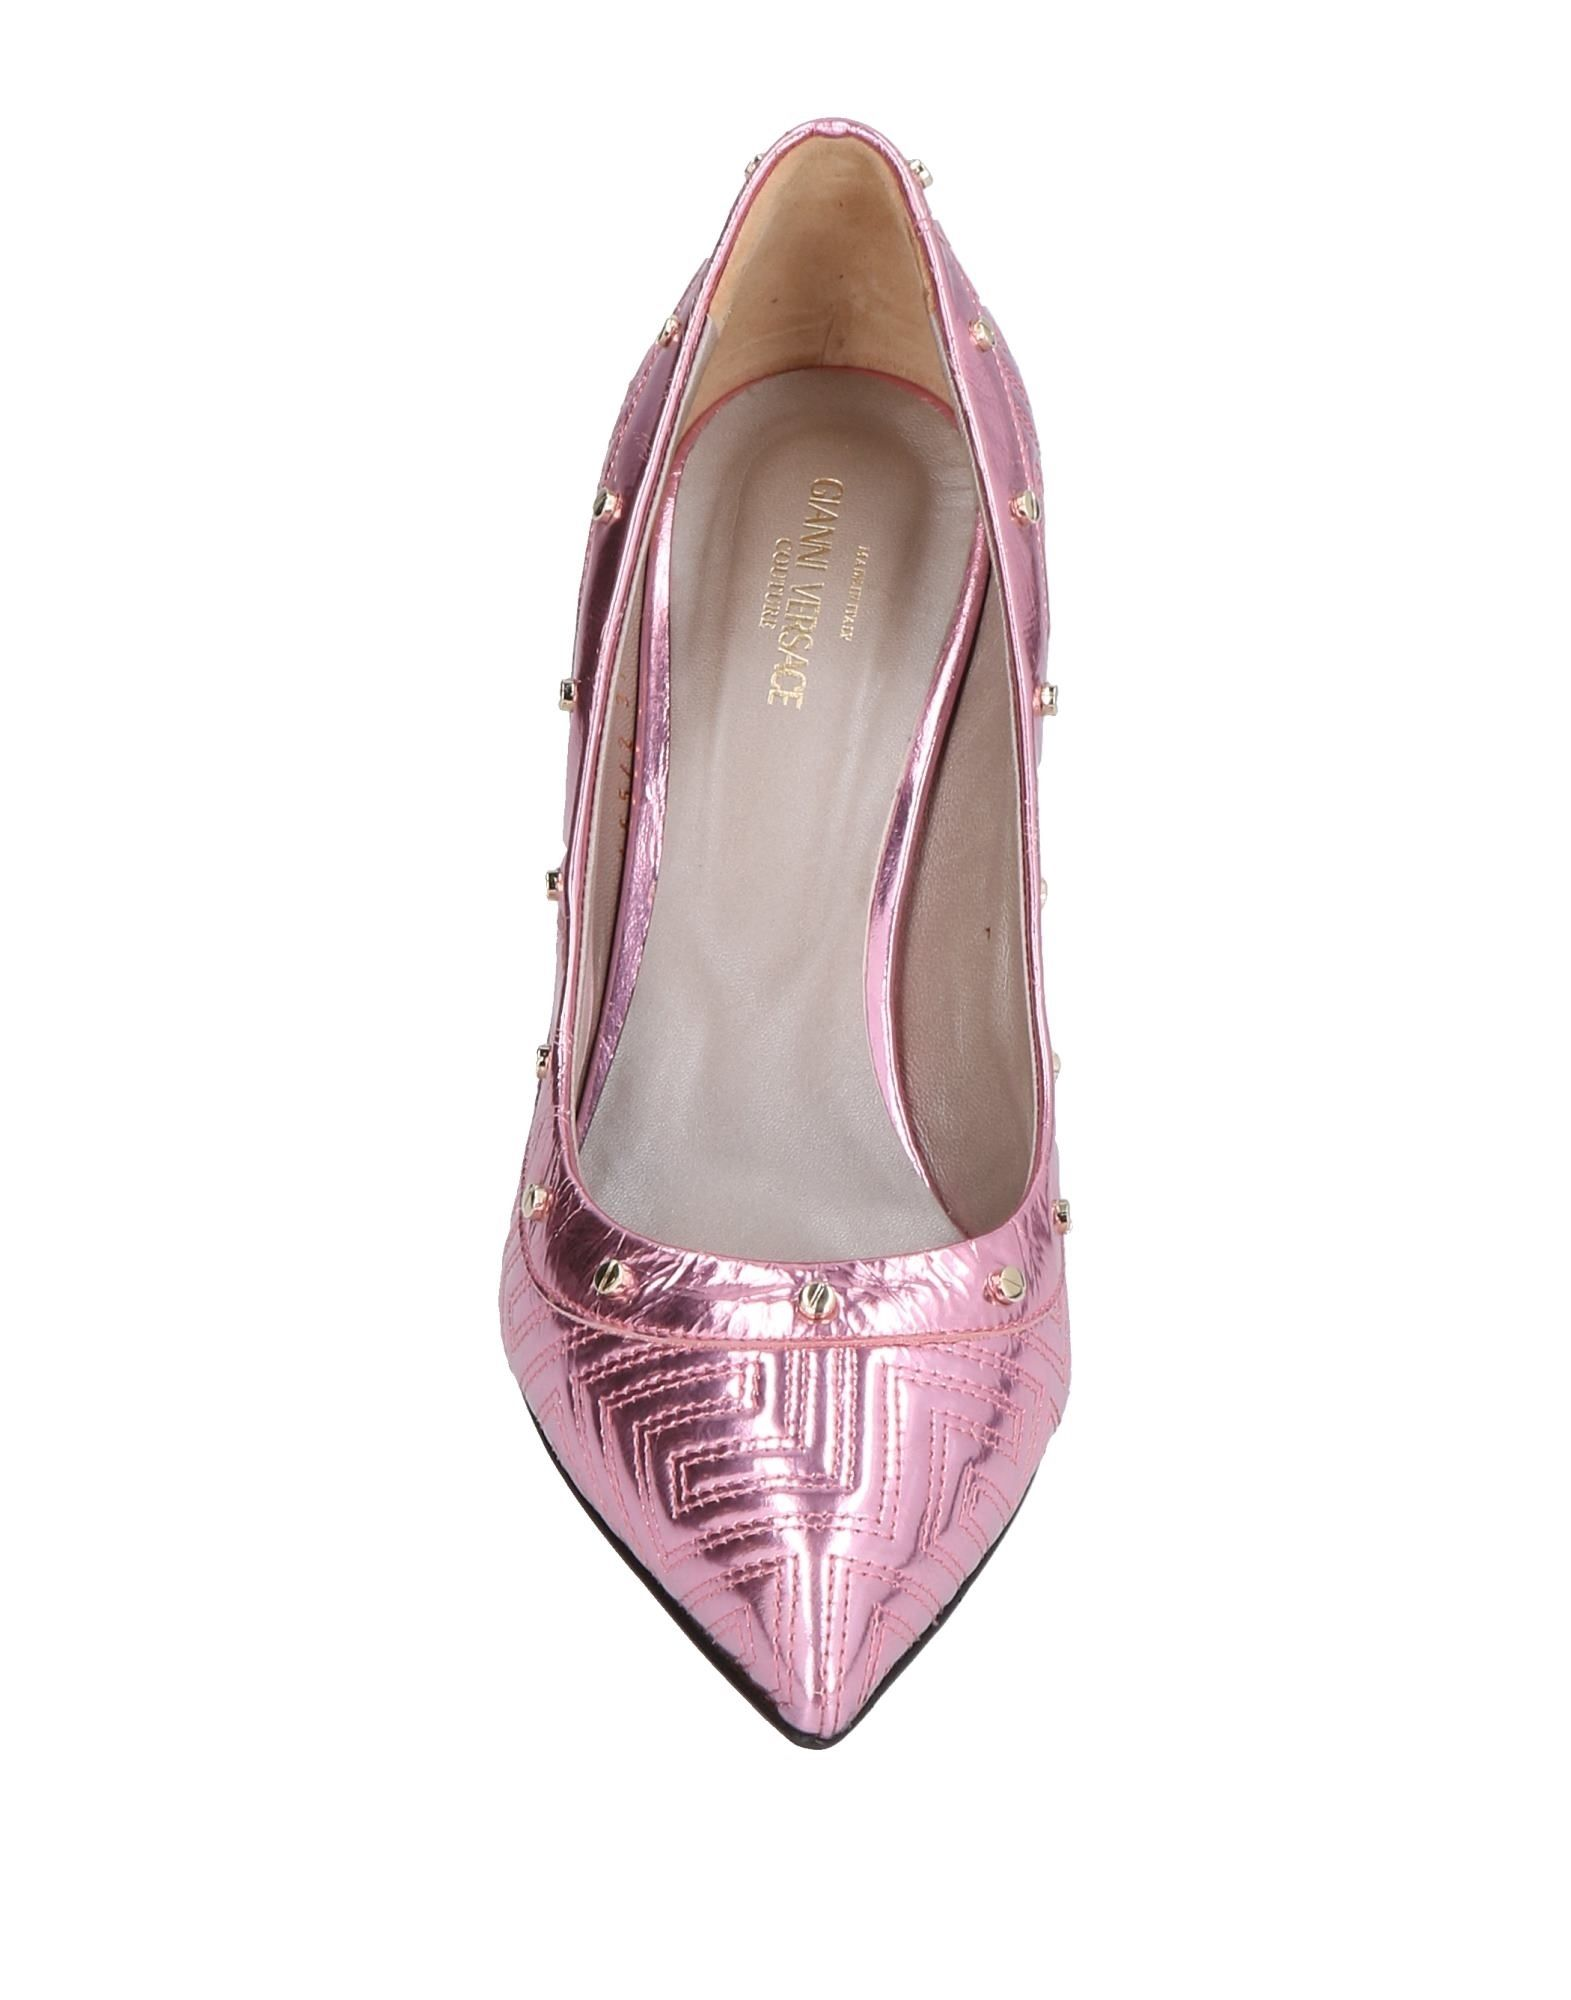 Gianni Versace 11483202IS Couture Pumps Damen  11483202IS Versace Neue Schuhe 47614a